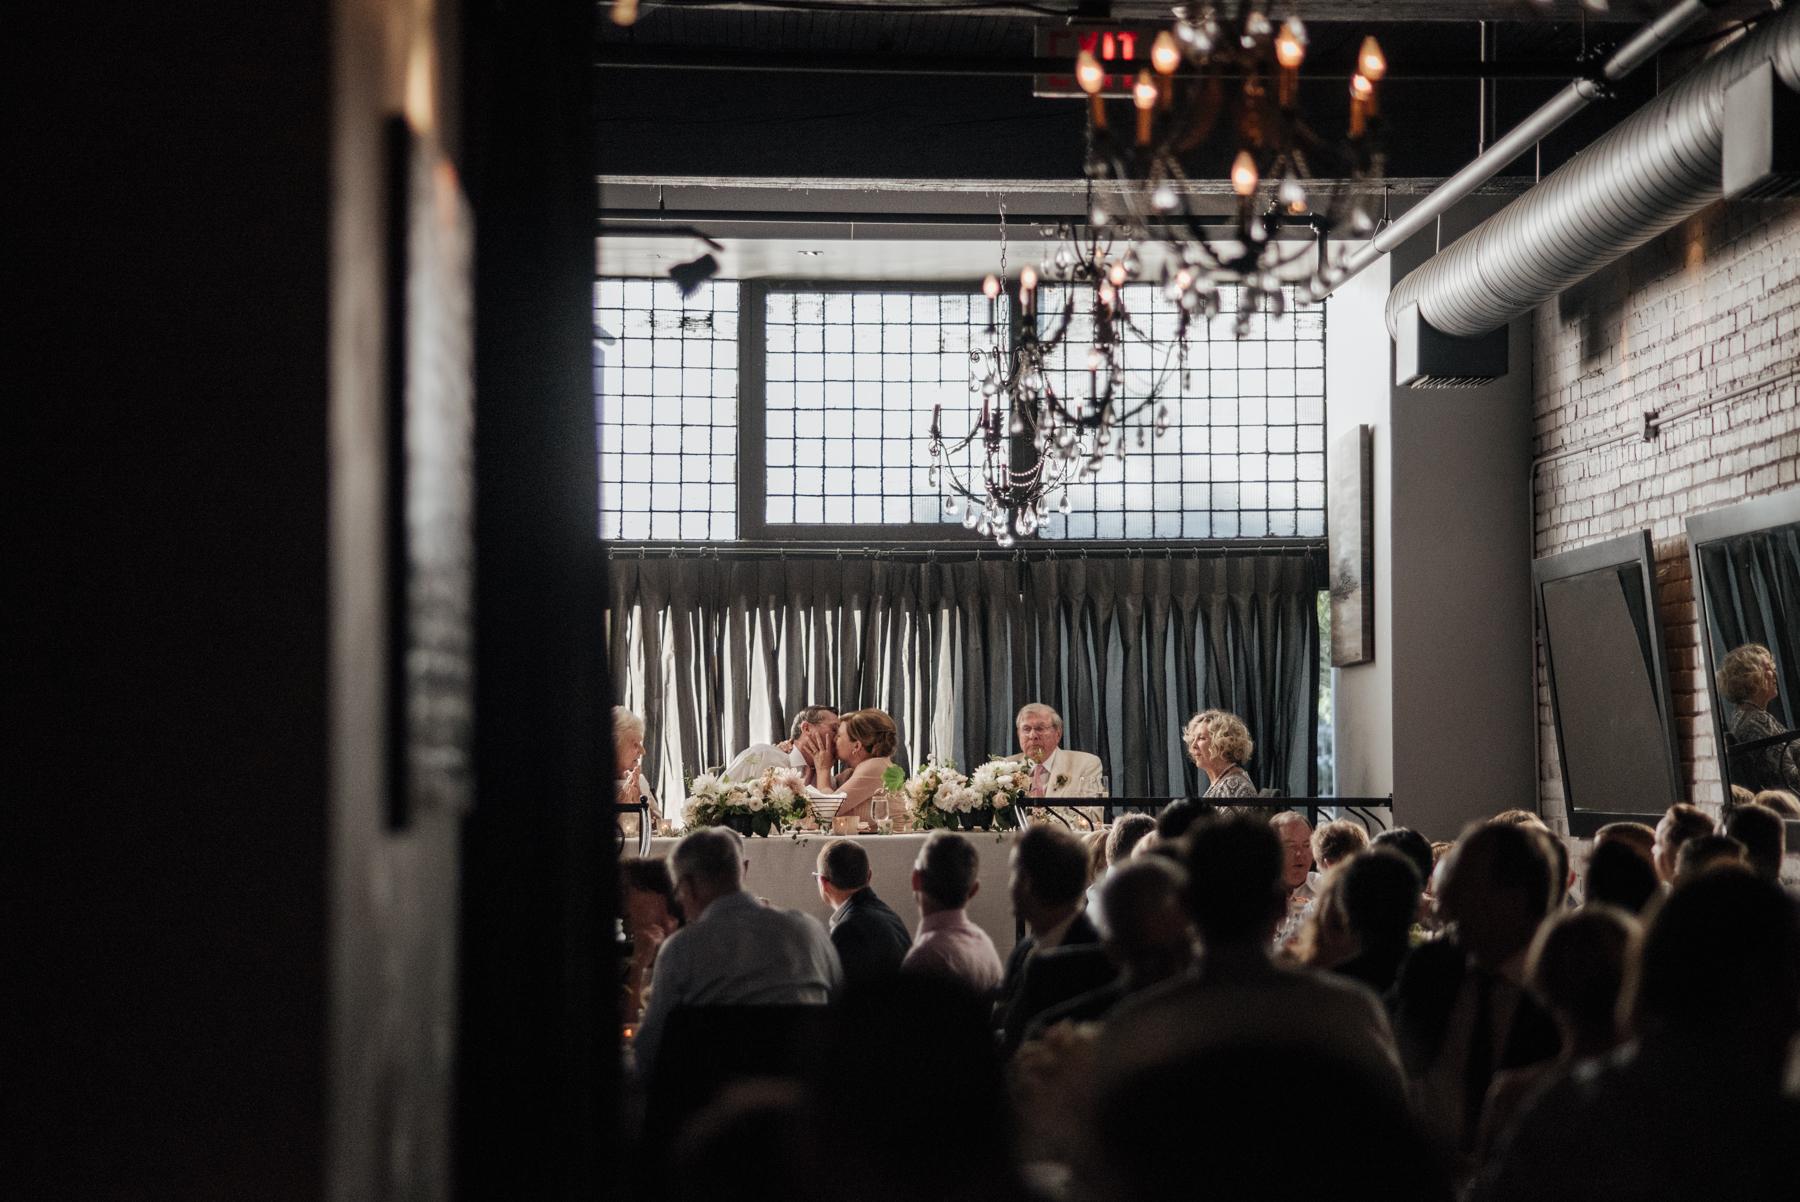 kaoverii_silva_photographer_cynthia_richard_wedding_vancouver_brix_&_mortar-32.jpg